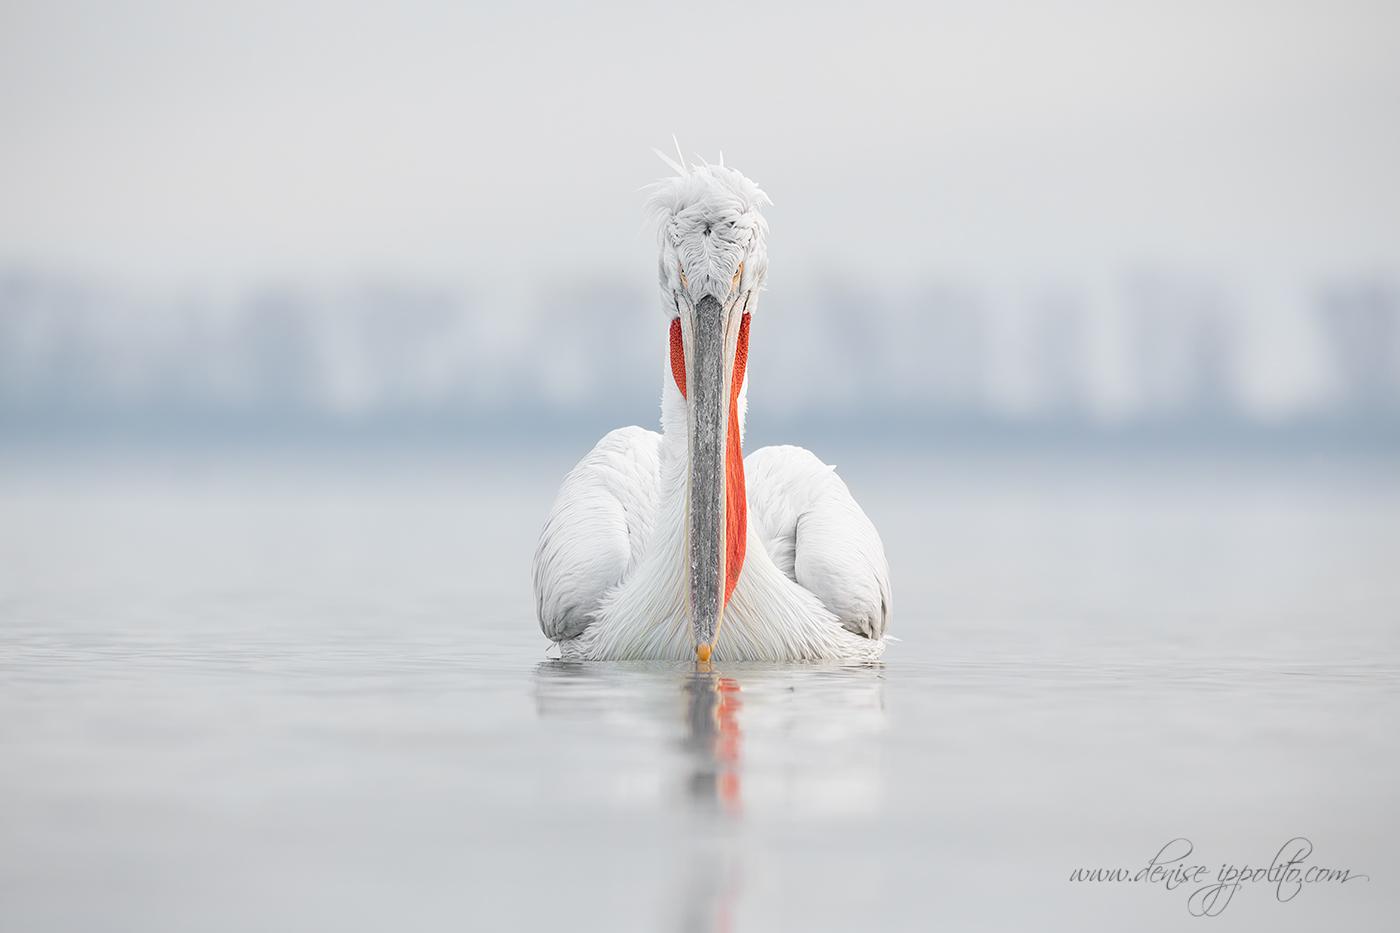 _65C9383Dalmatian-Pelicans,-Greece.jpg